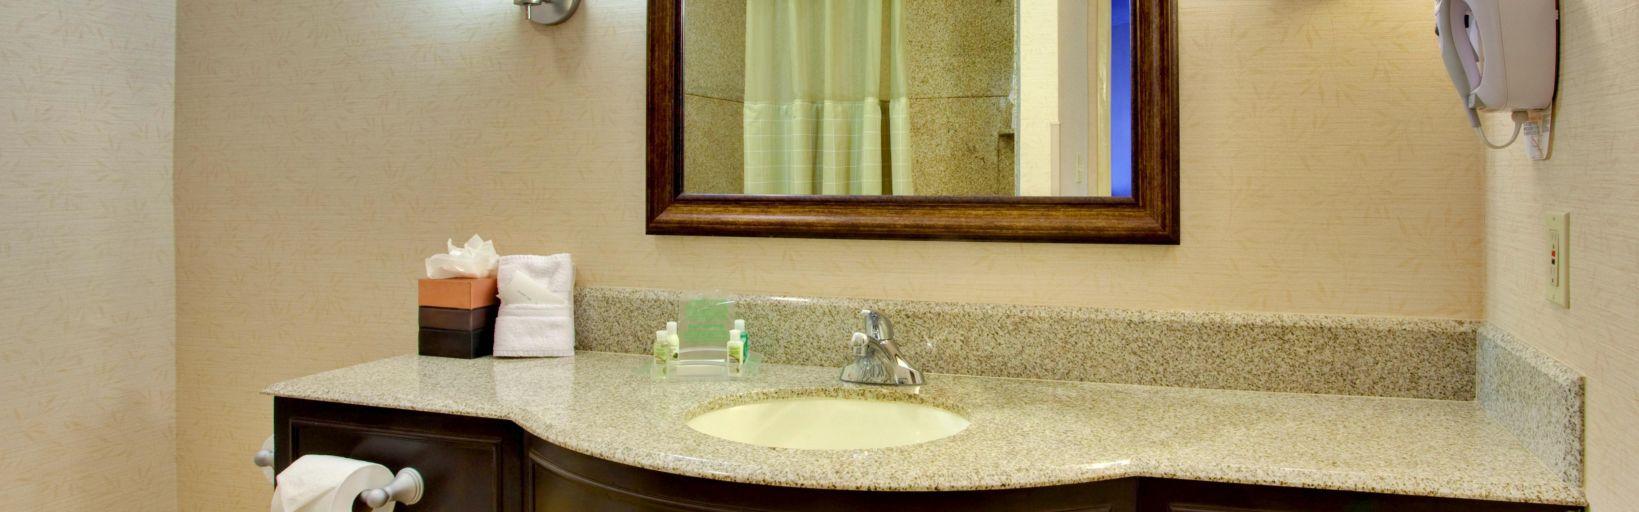 Holiday inn san diego la mesa hotel by ihg guest bathroom solutioingenieria Image collections